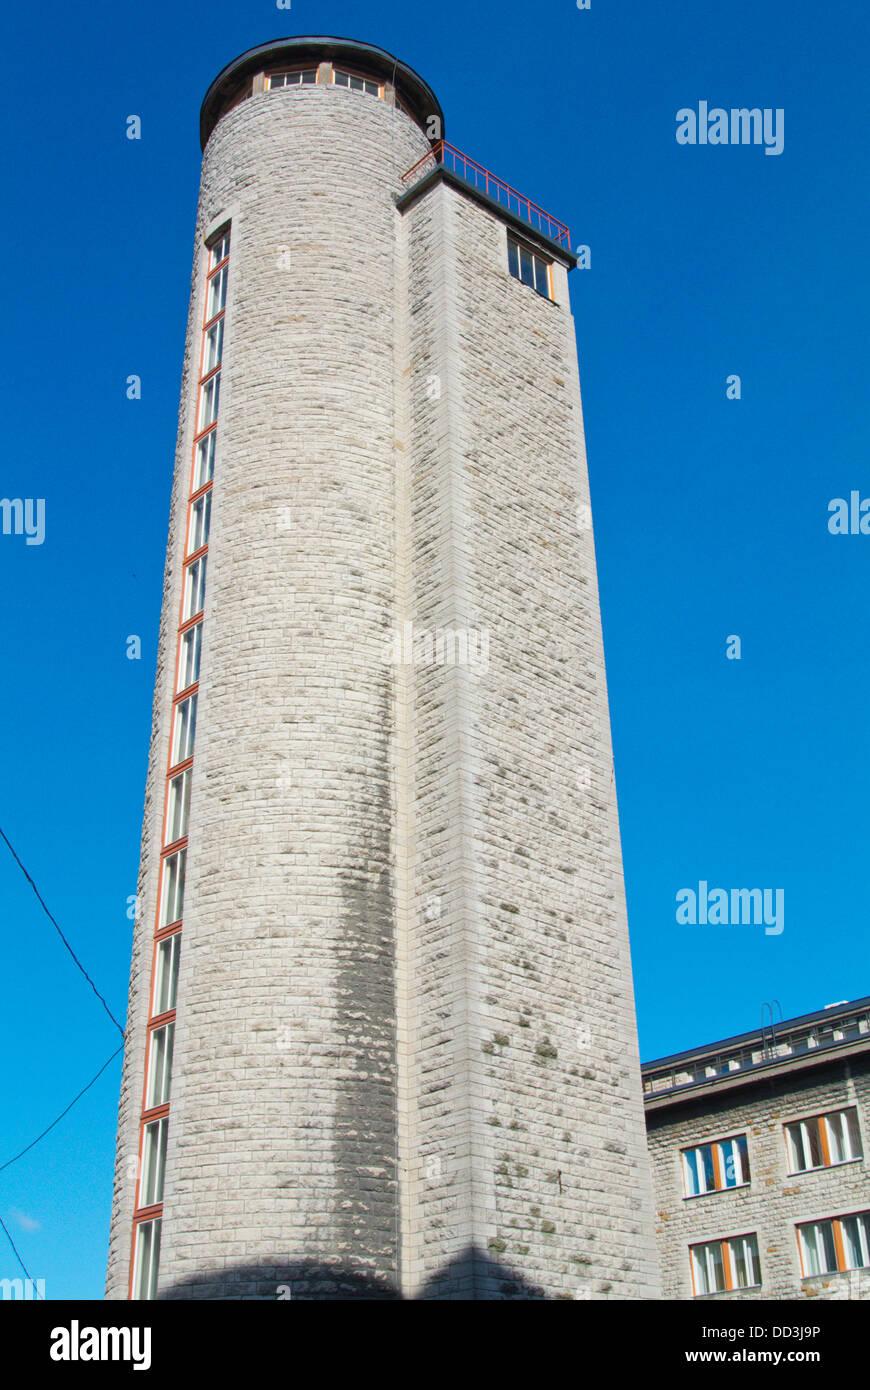 Former fire station tower (1939) by Herbert Johanson at Raua street central Tallinn Estonia the Baltics Europe - Stock Image